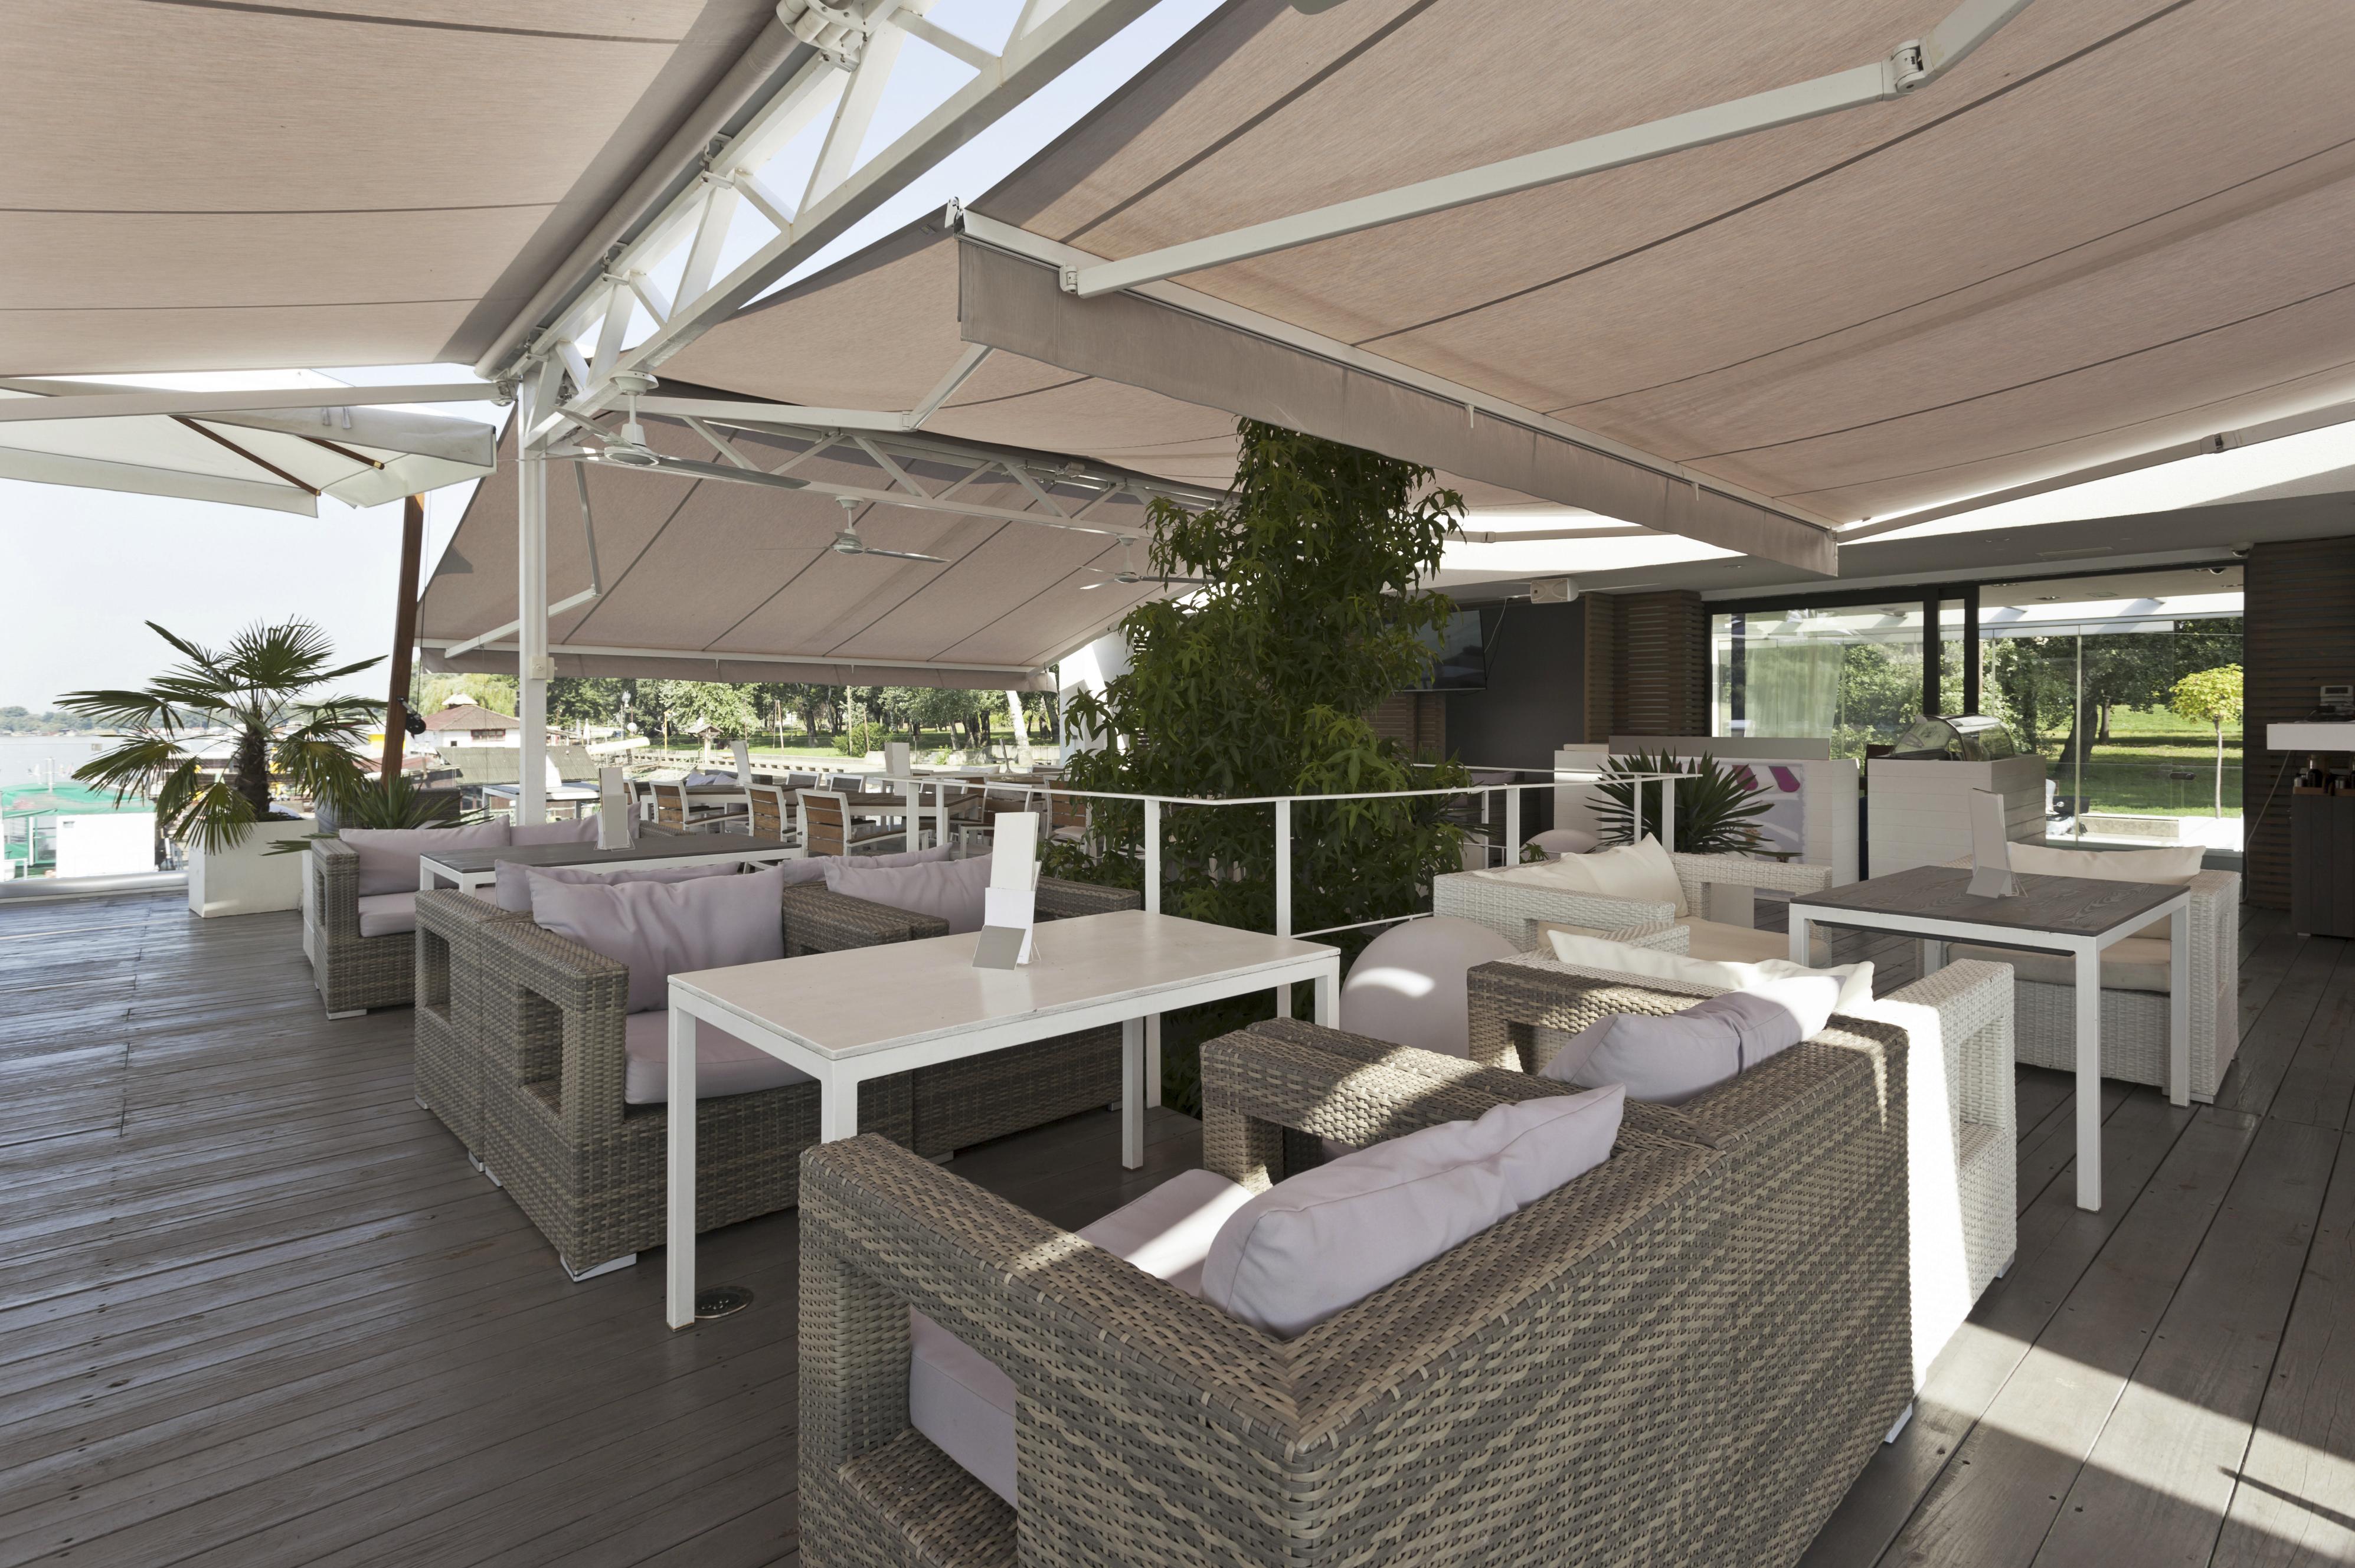 Instalación integral de toldos en terrazas